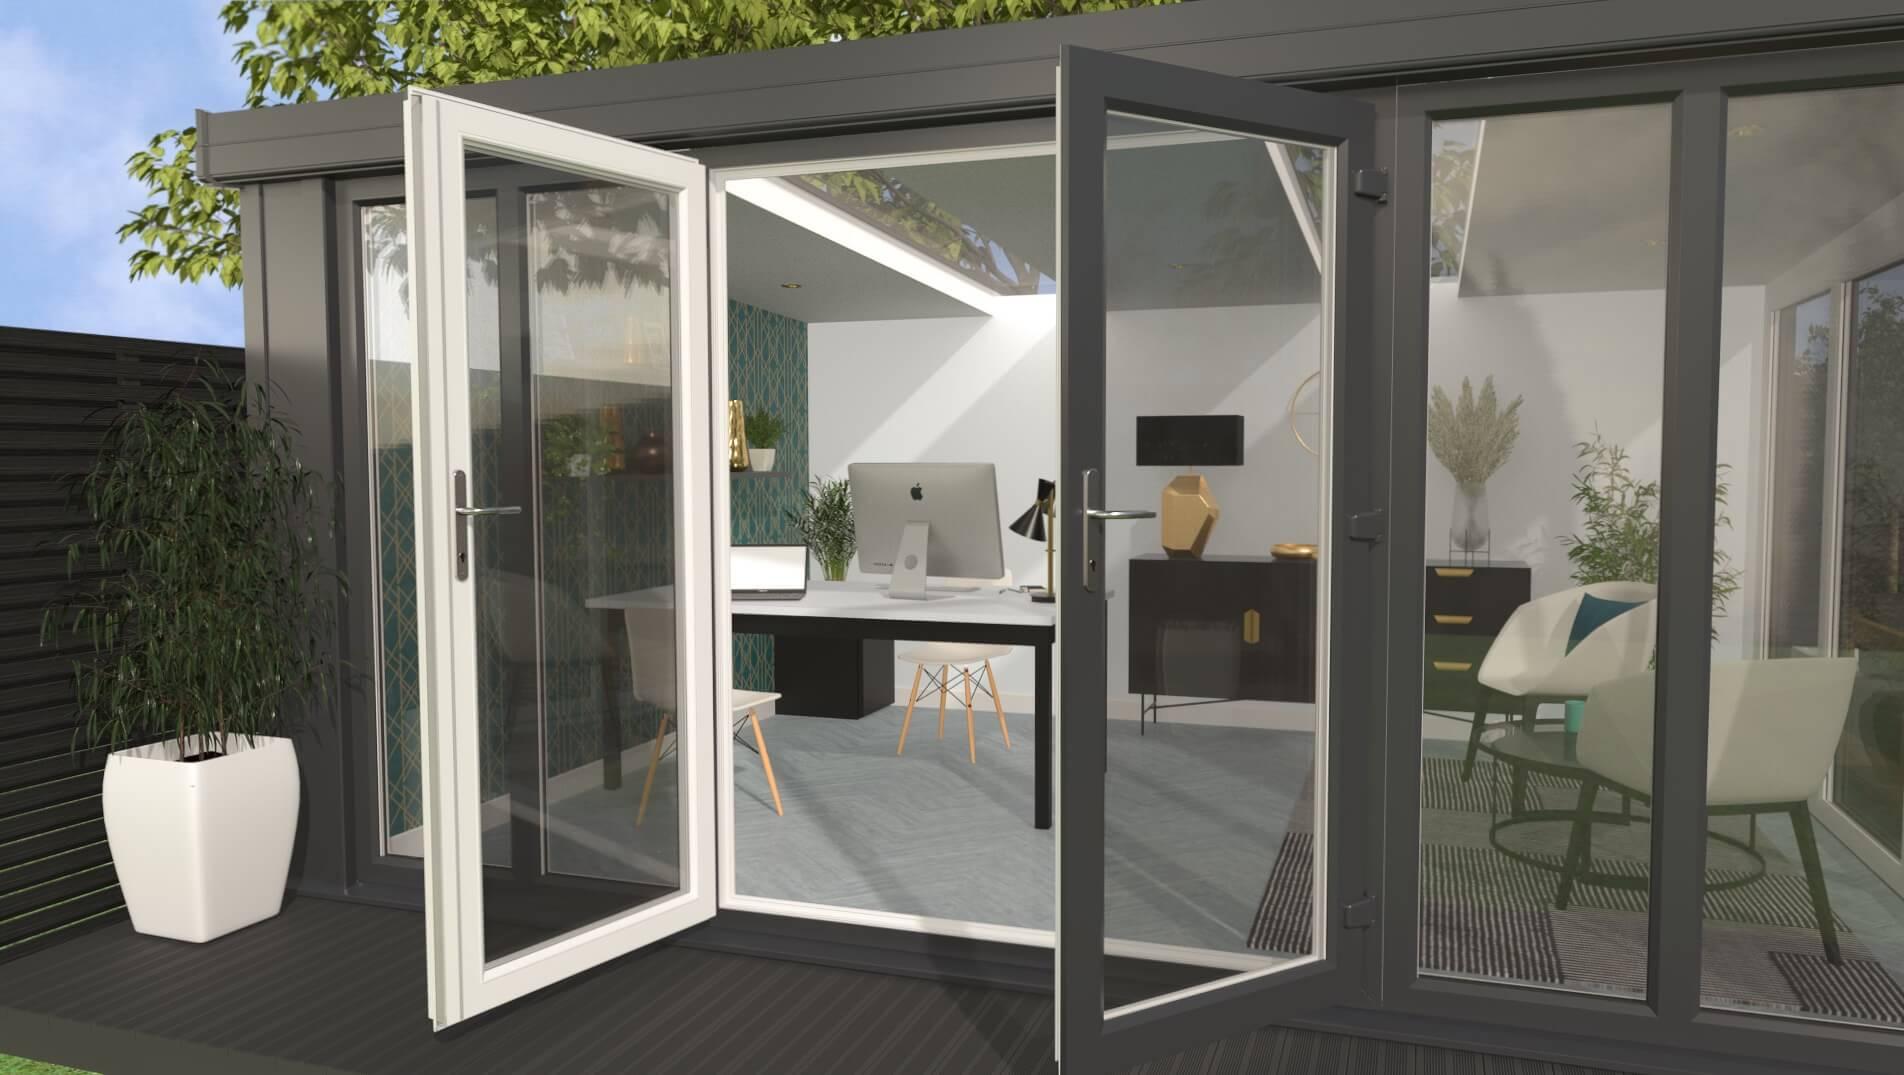 garden rooms & home offices harlow, essex